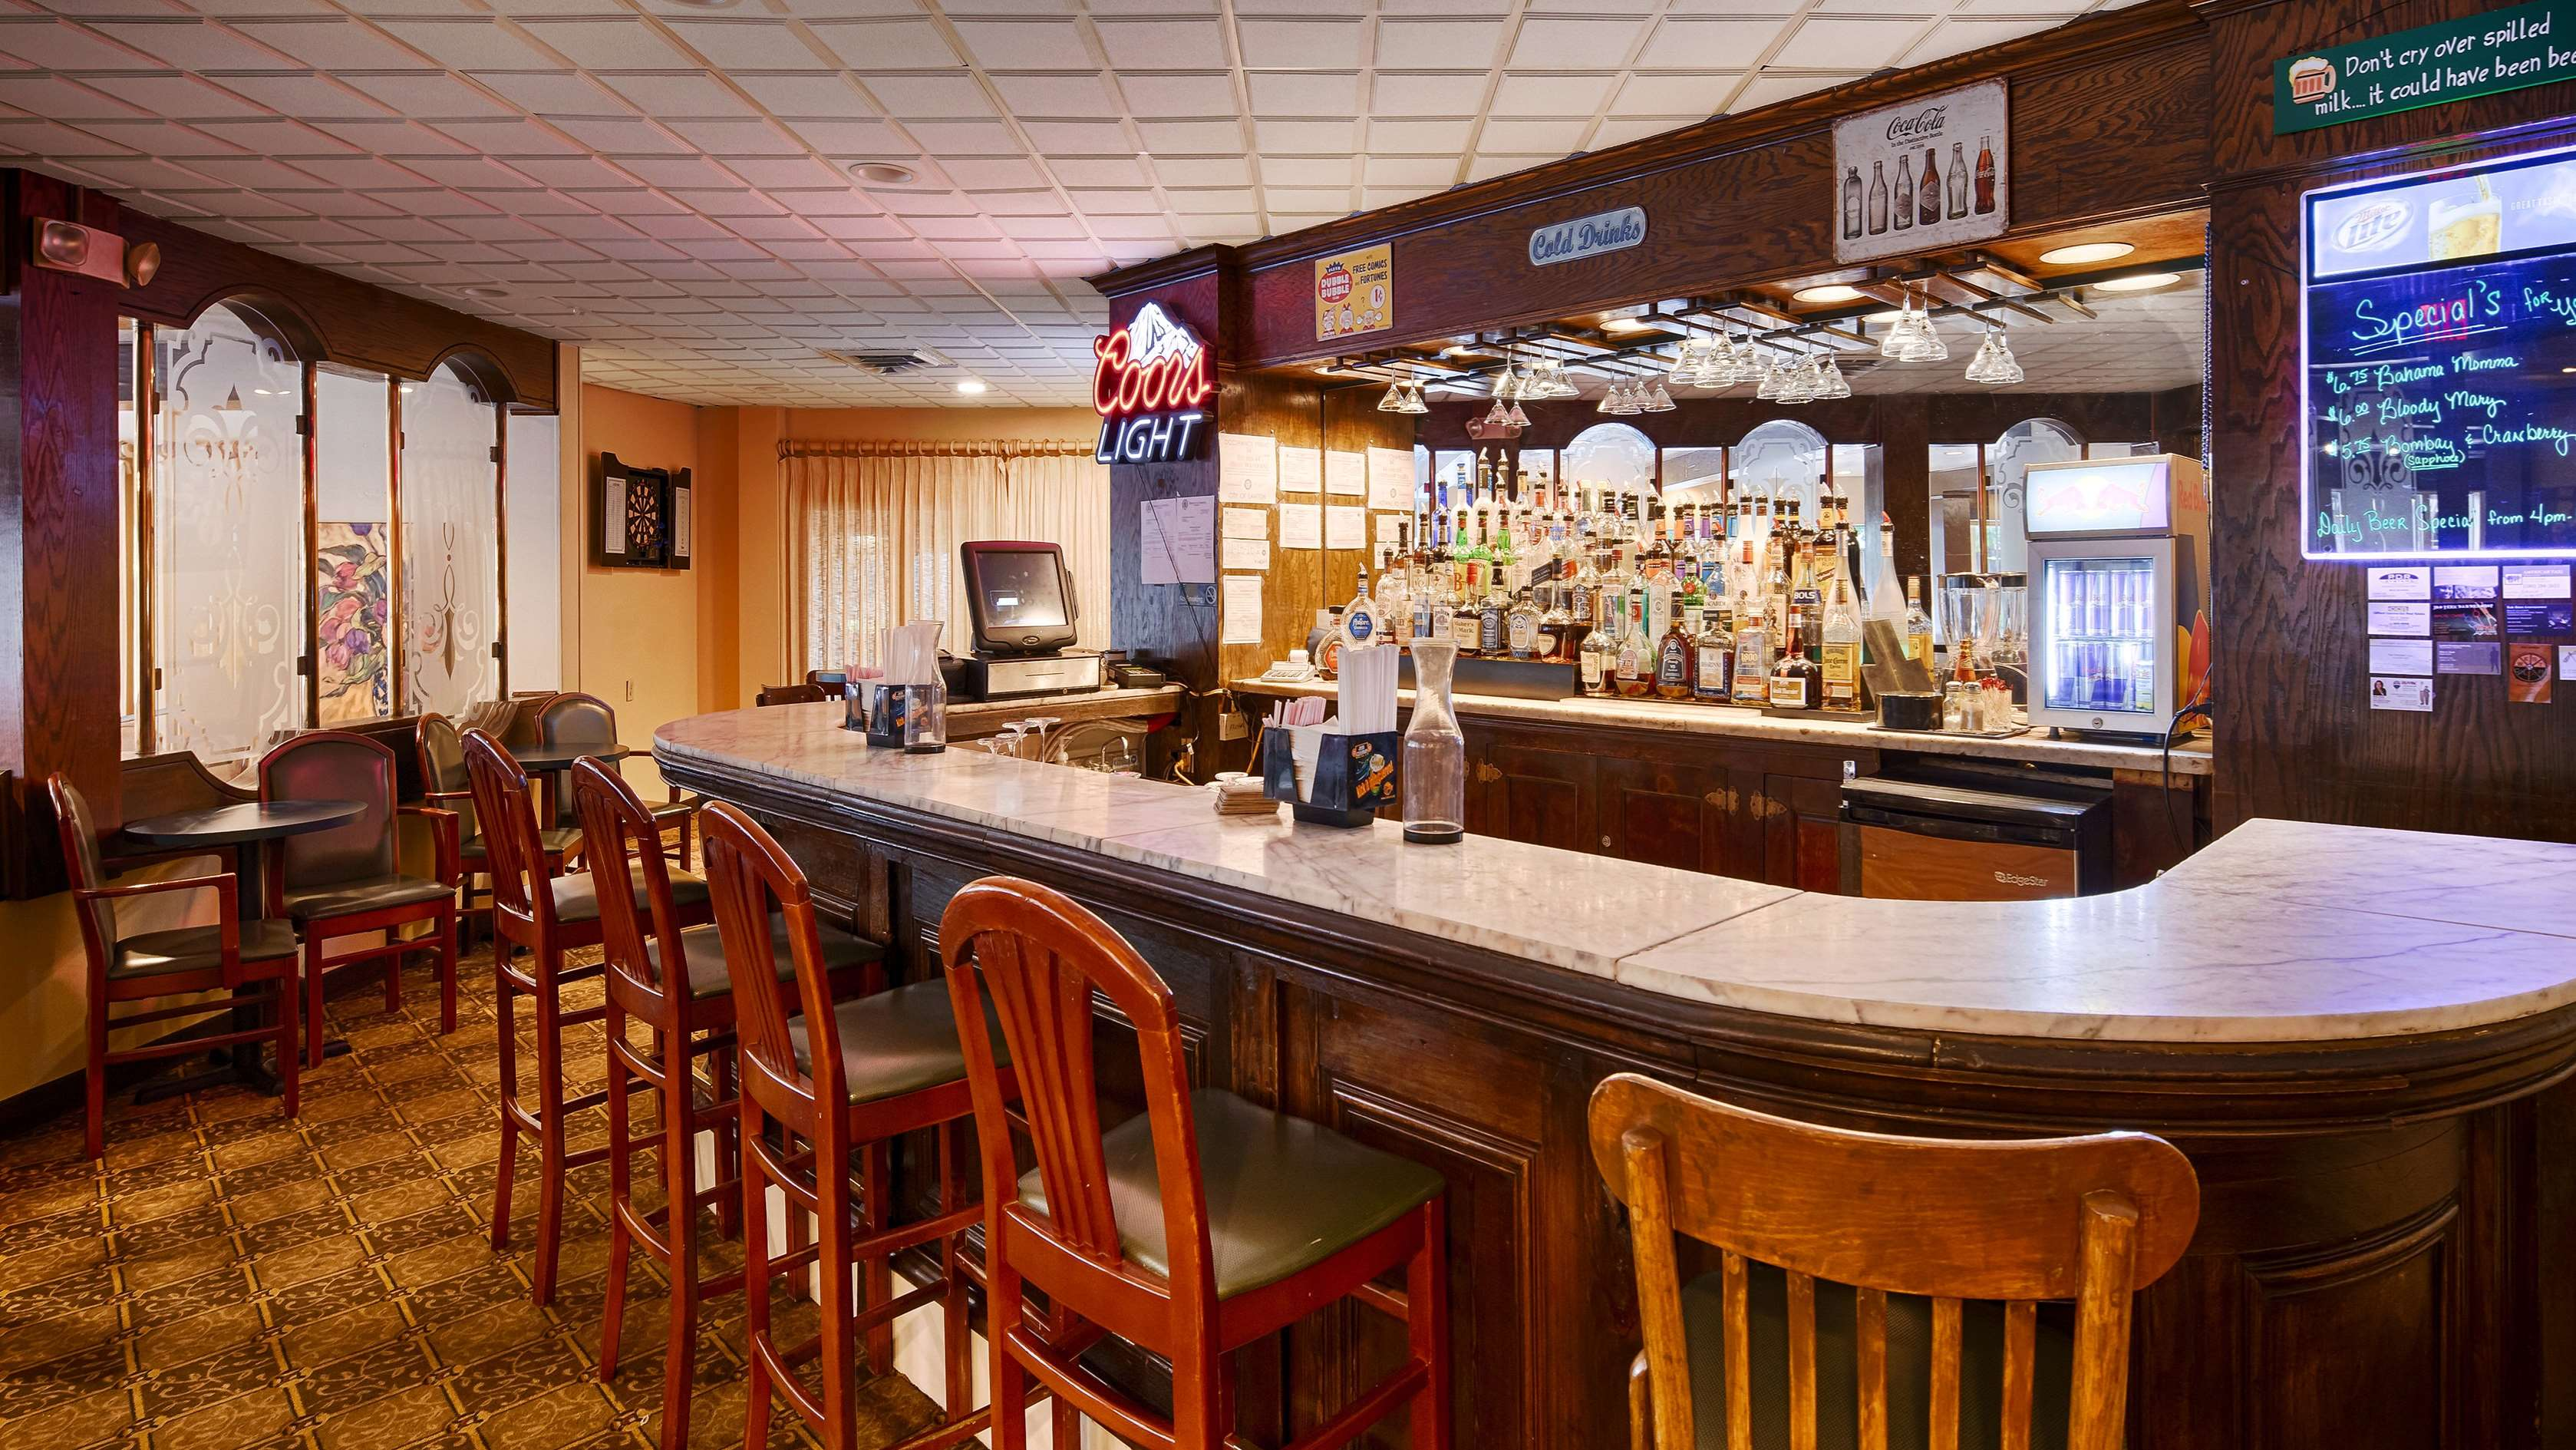 Best Western Plus Lawton Hotel & Convention Center image 26